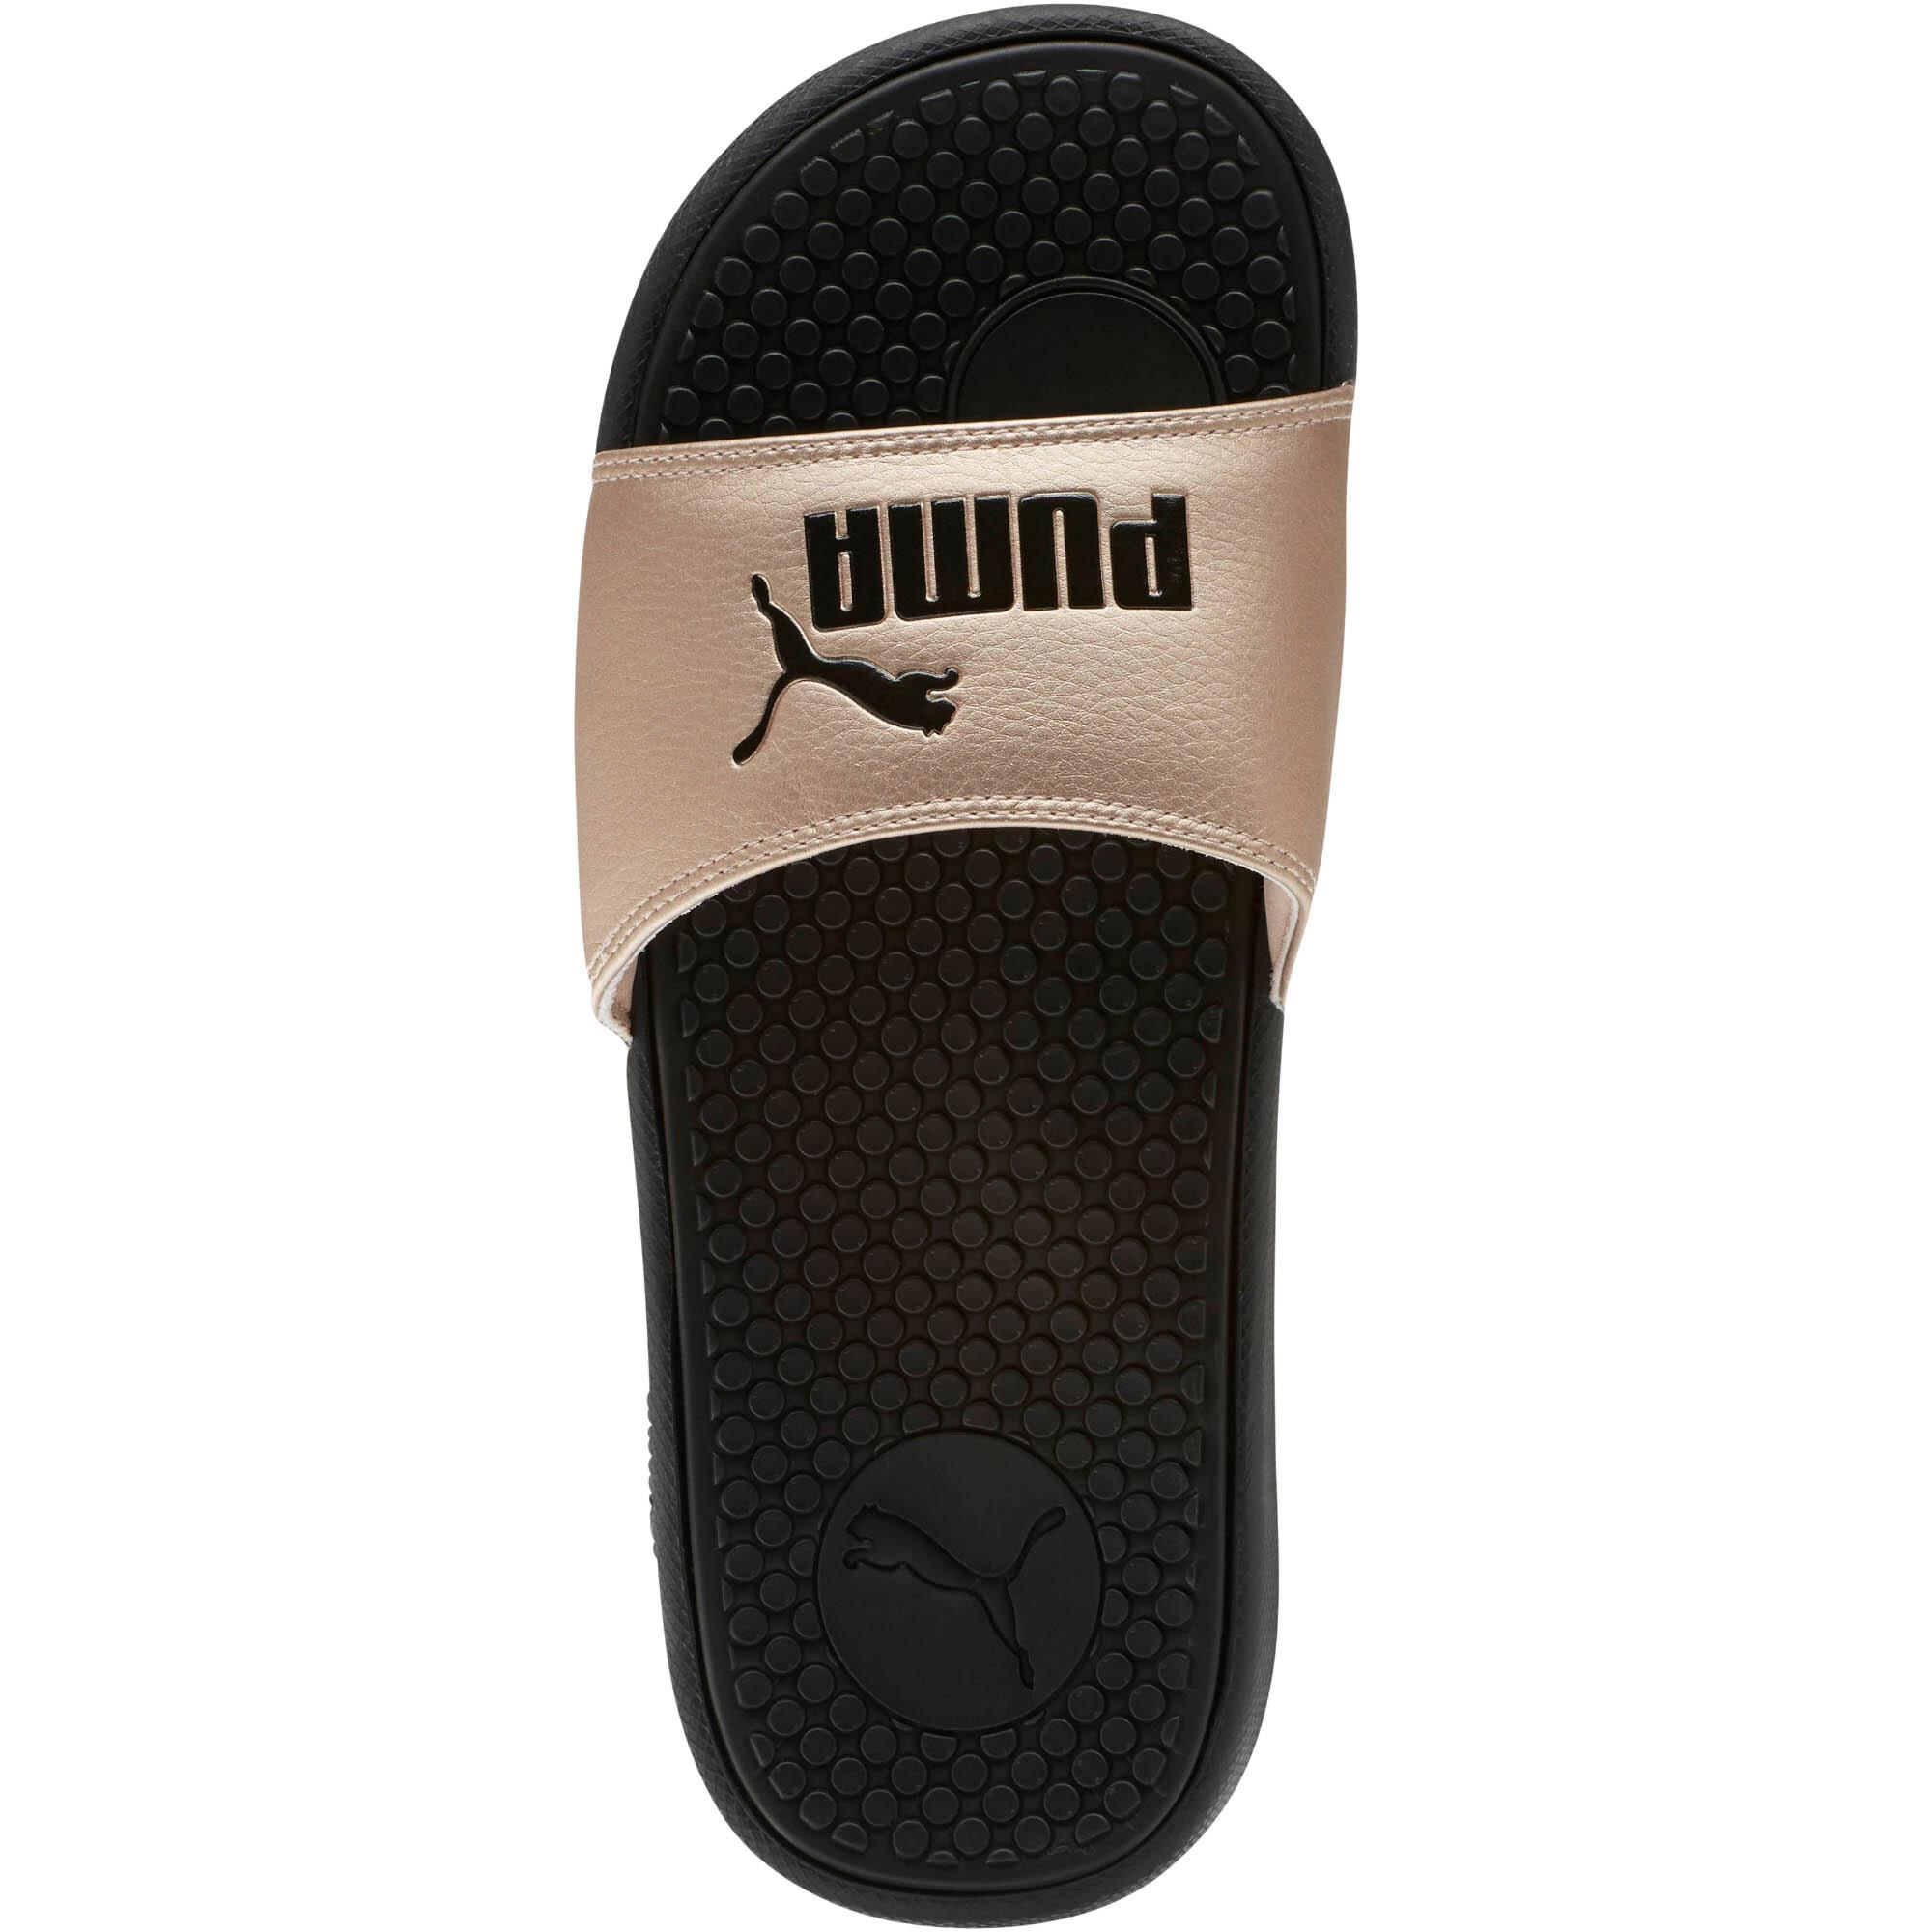 PUMA-Cool-Cat-Metallic-Women-s-Slides-Women-Sandal-Swimming-Beach thumbnail 6